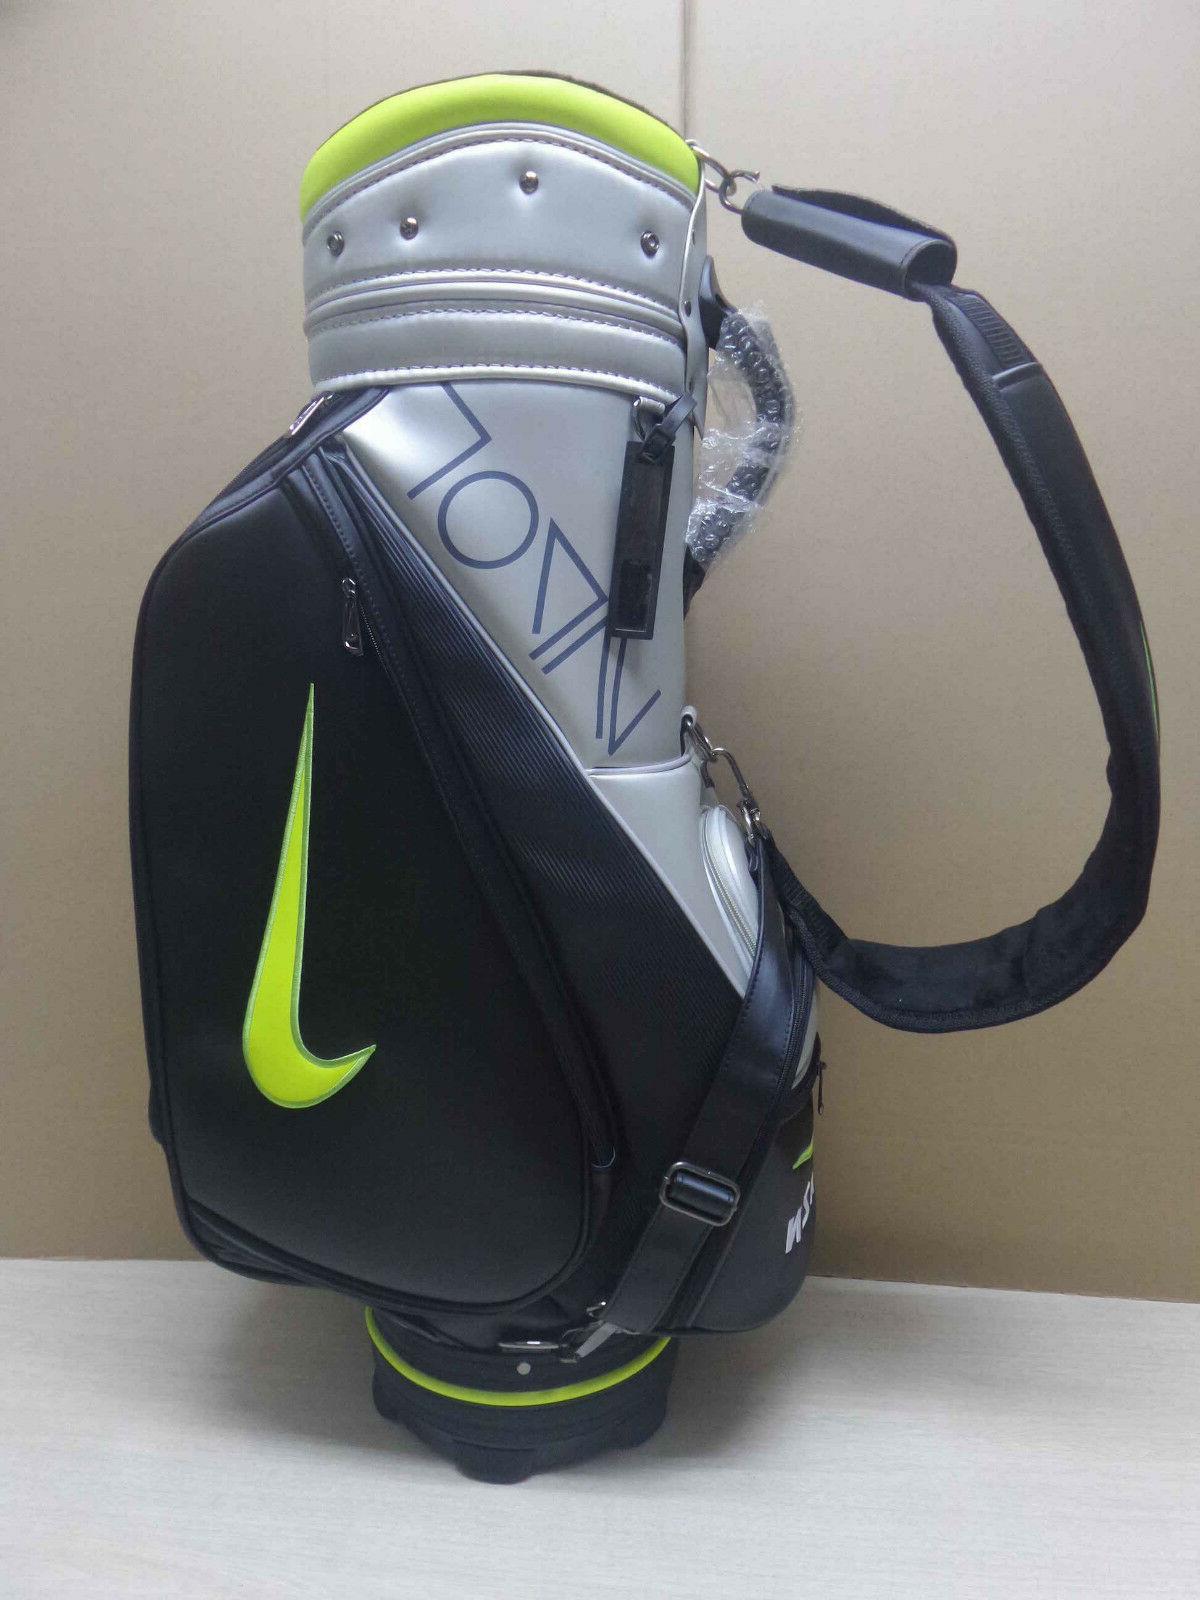 New Nike Staff Cart Golf Japanese Model, Black